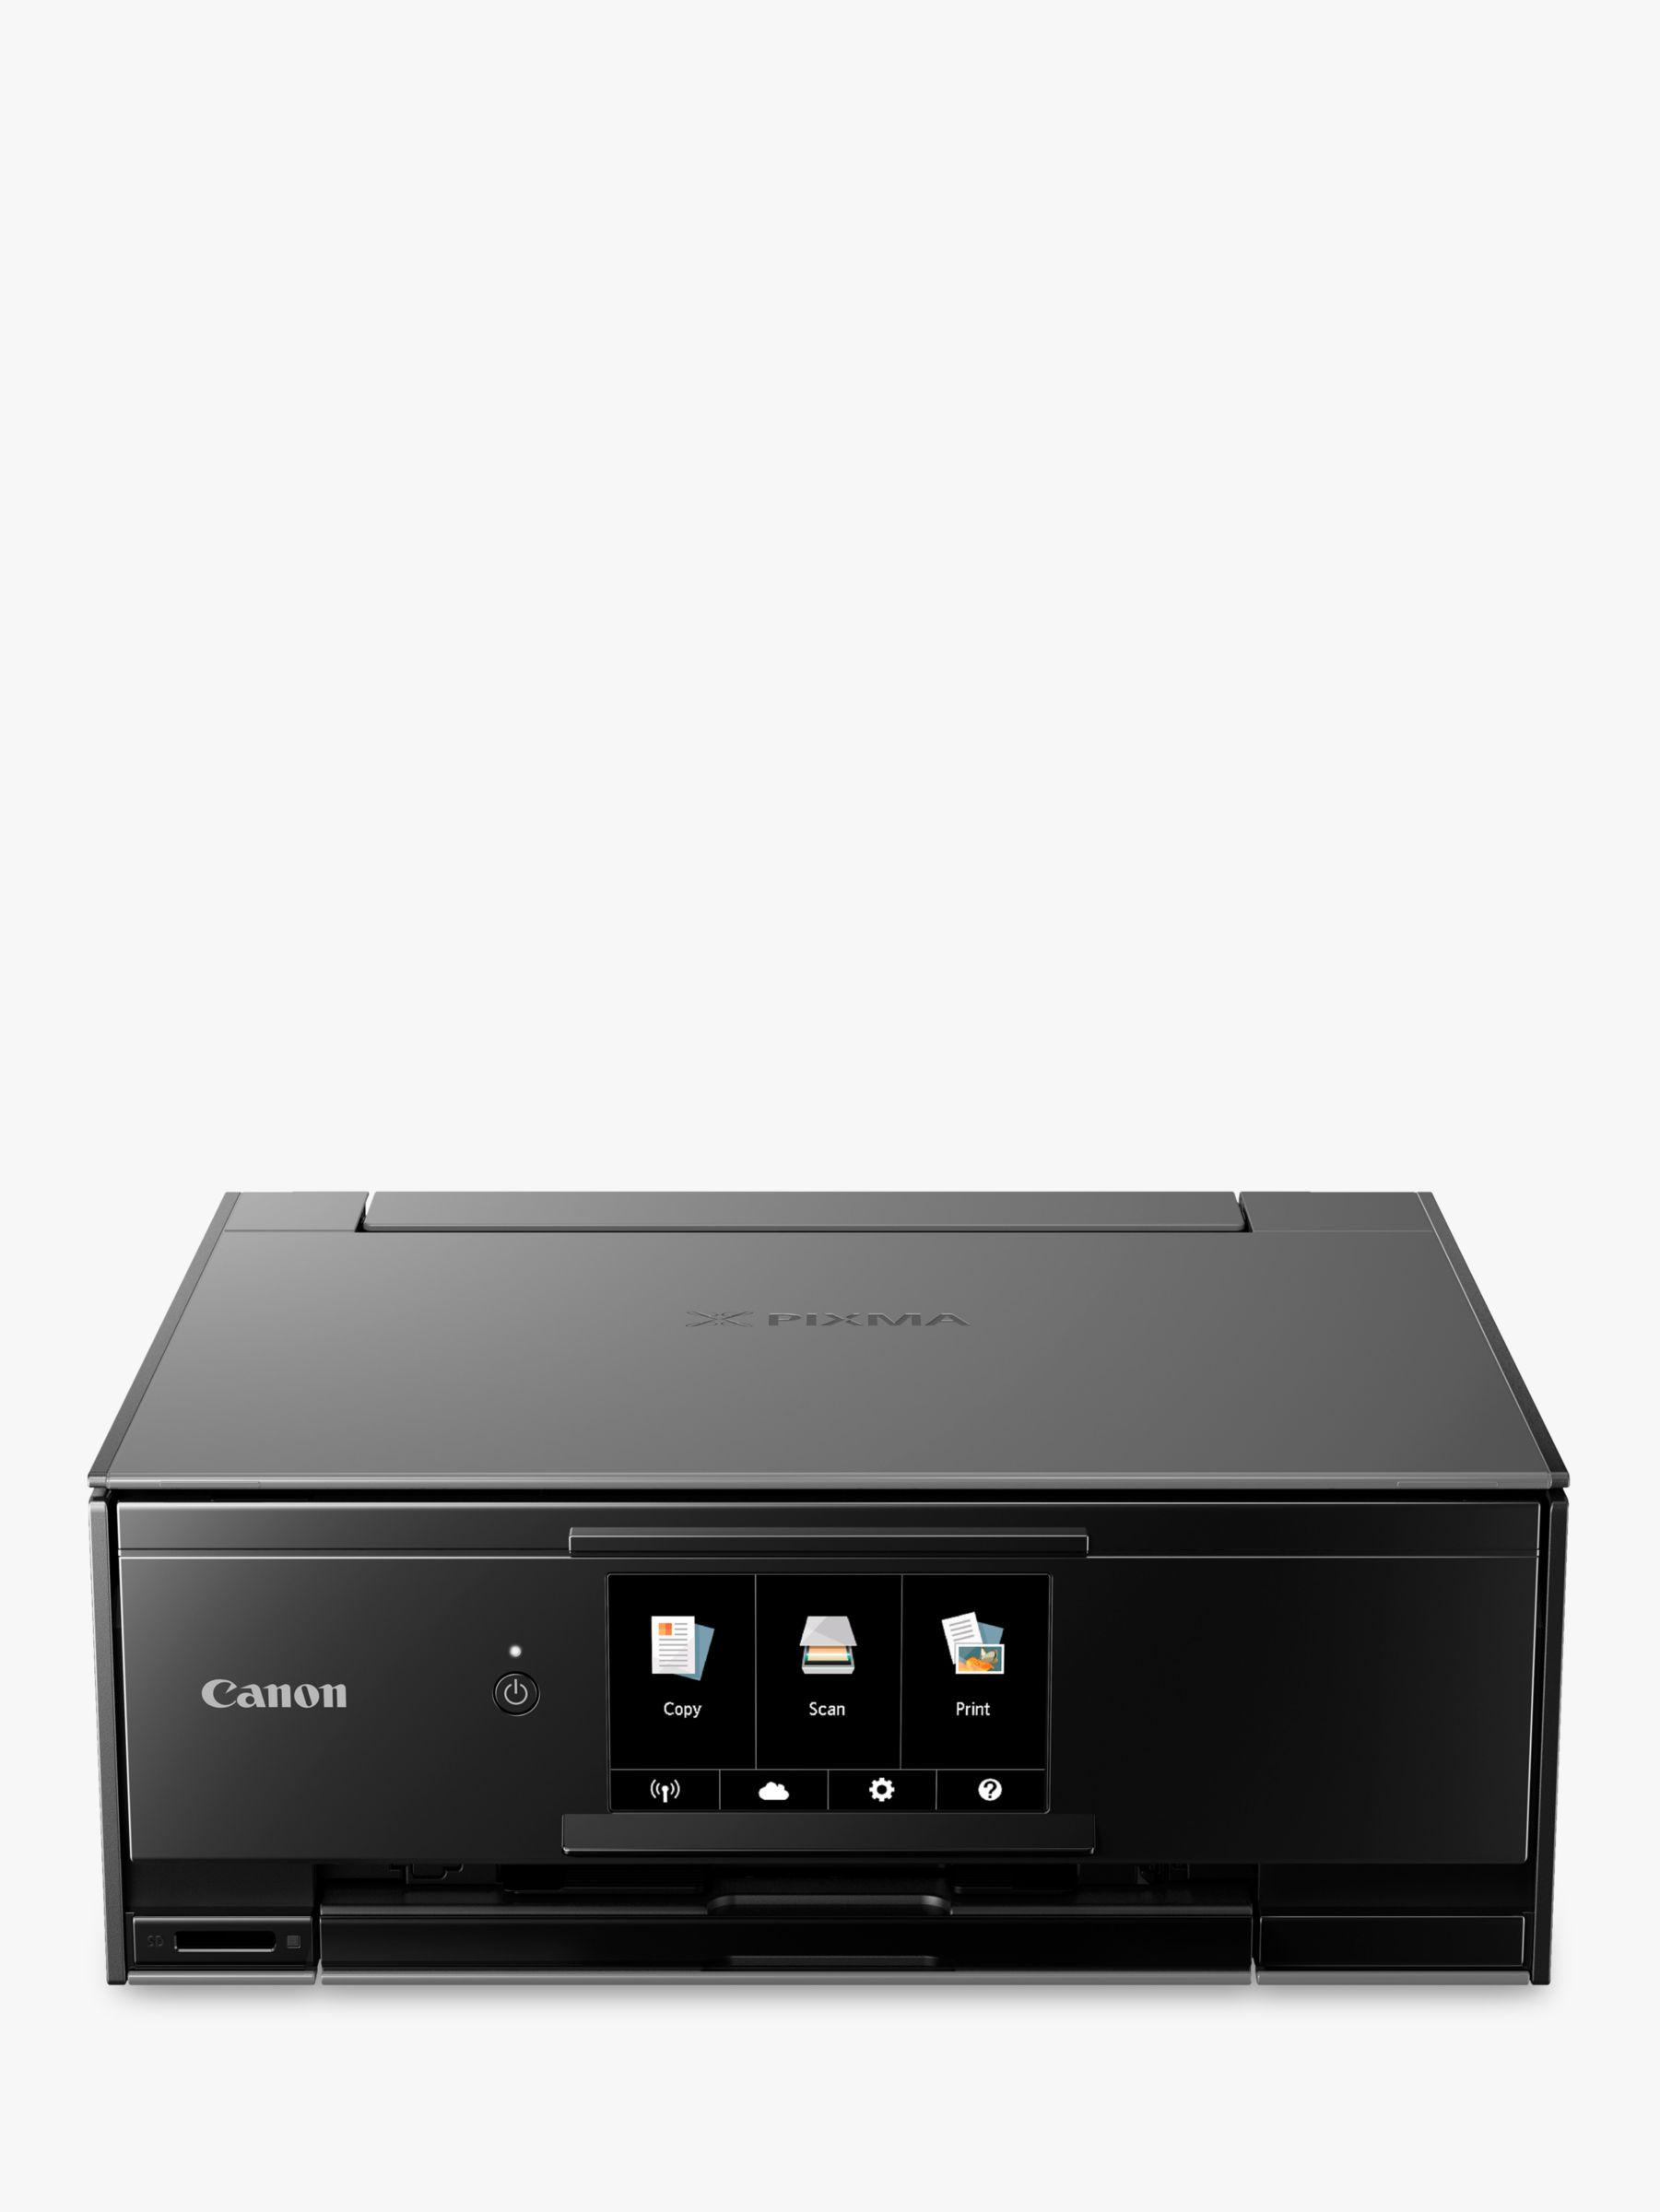 Canon Canon PIXMA TS9150 All-in-One Wireless Wi-Fi Printer with Auto-Tilting Touch Screen, Dark Grey